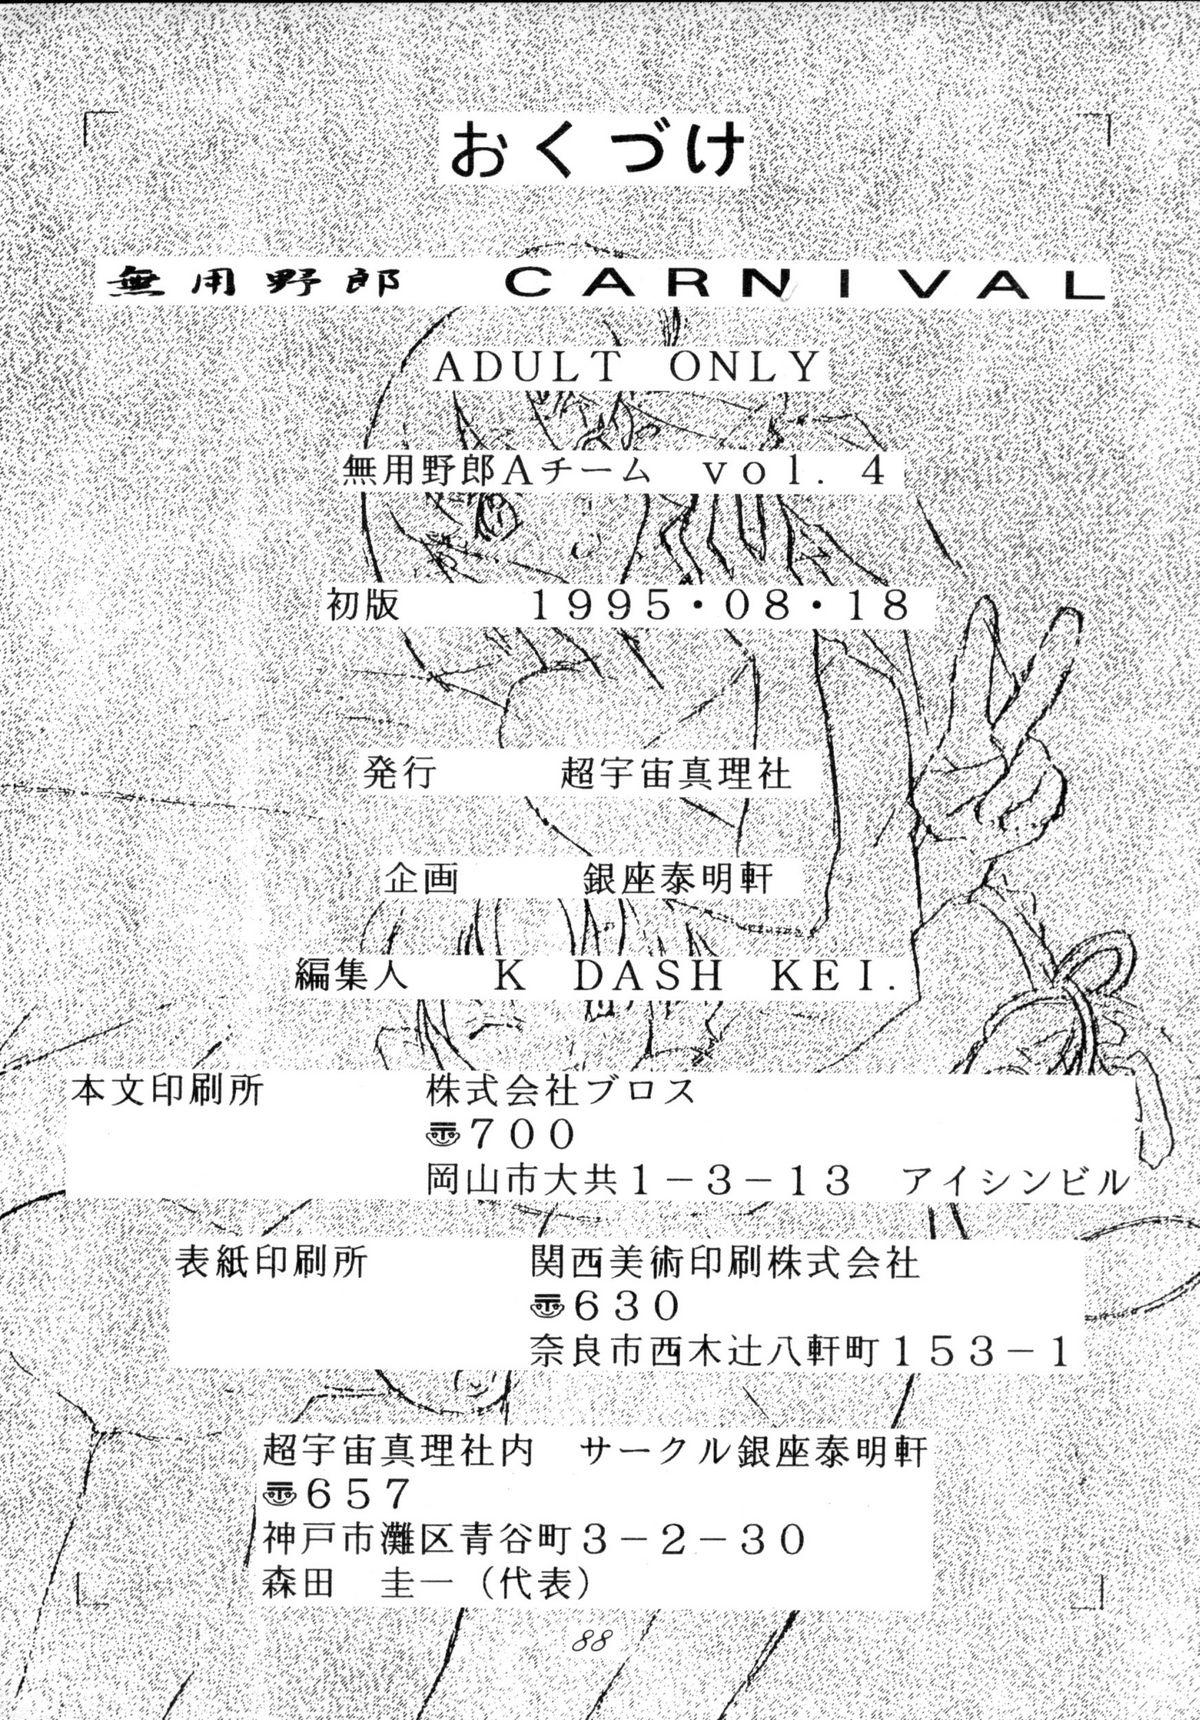 Muyou Yarou A-Team 4 Carnival 86